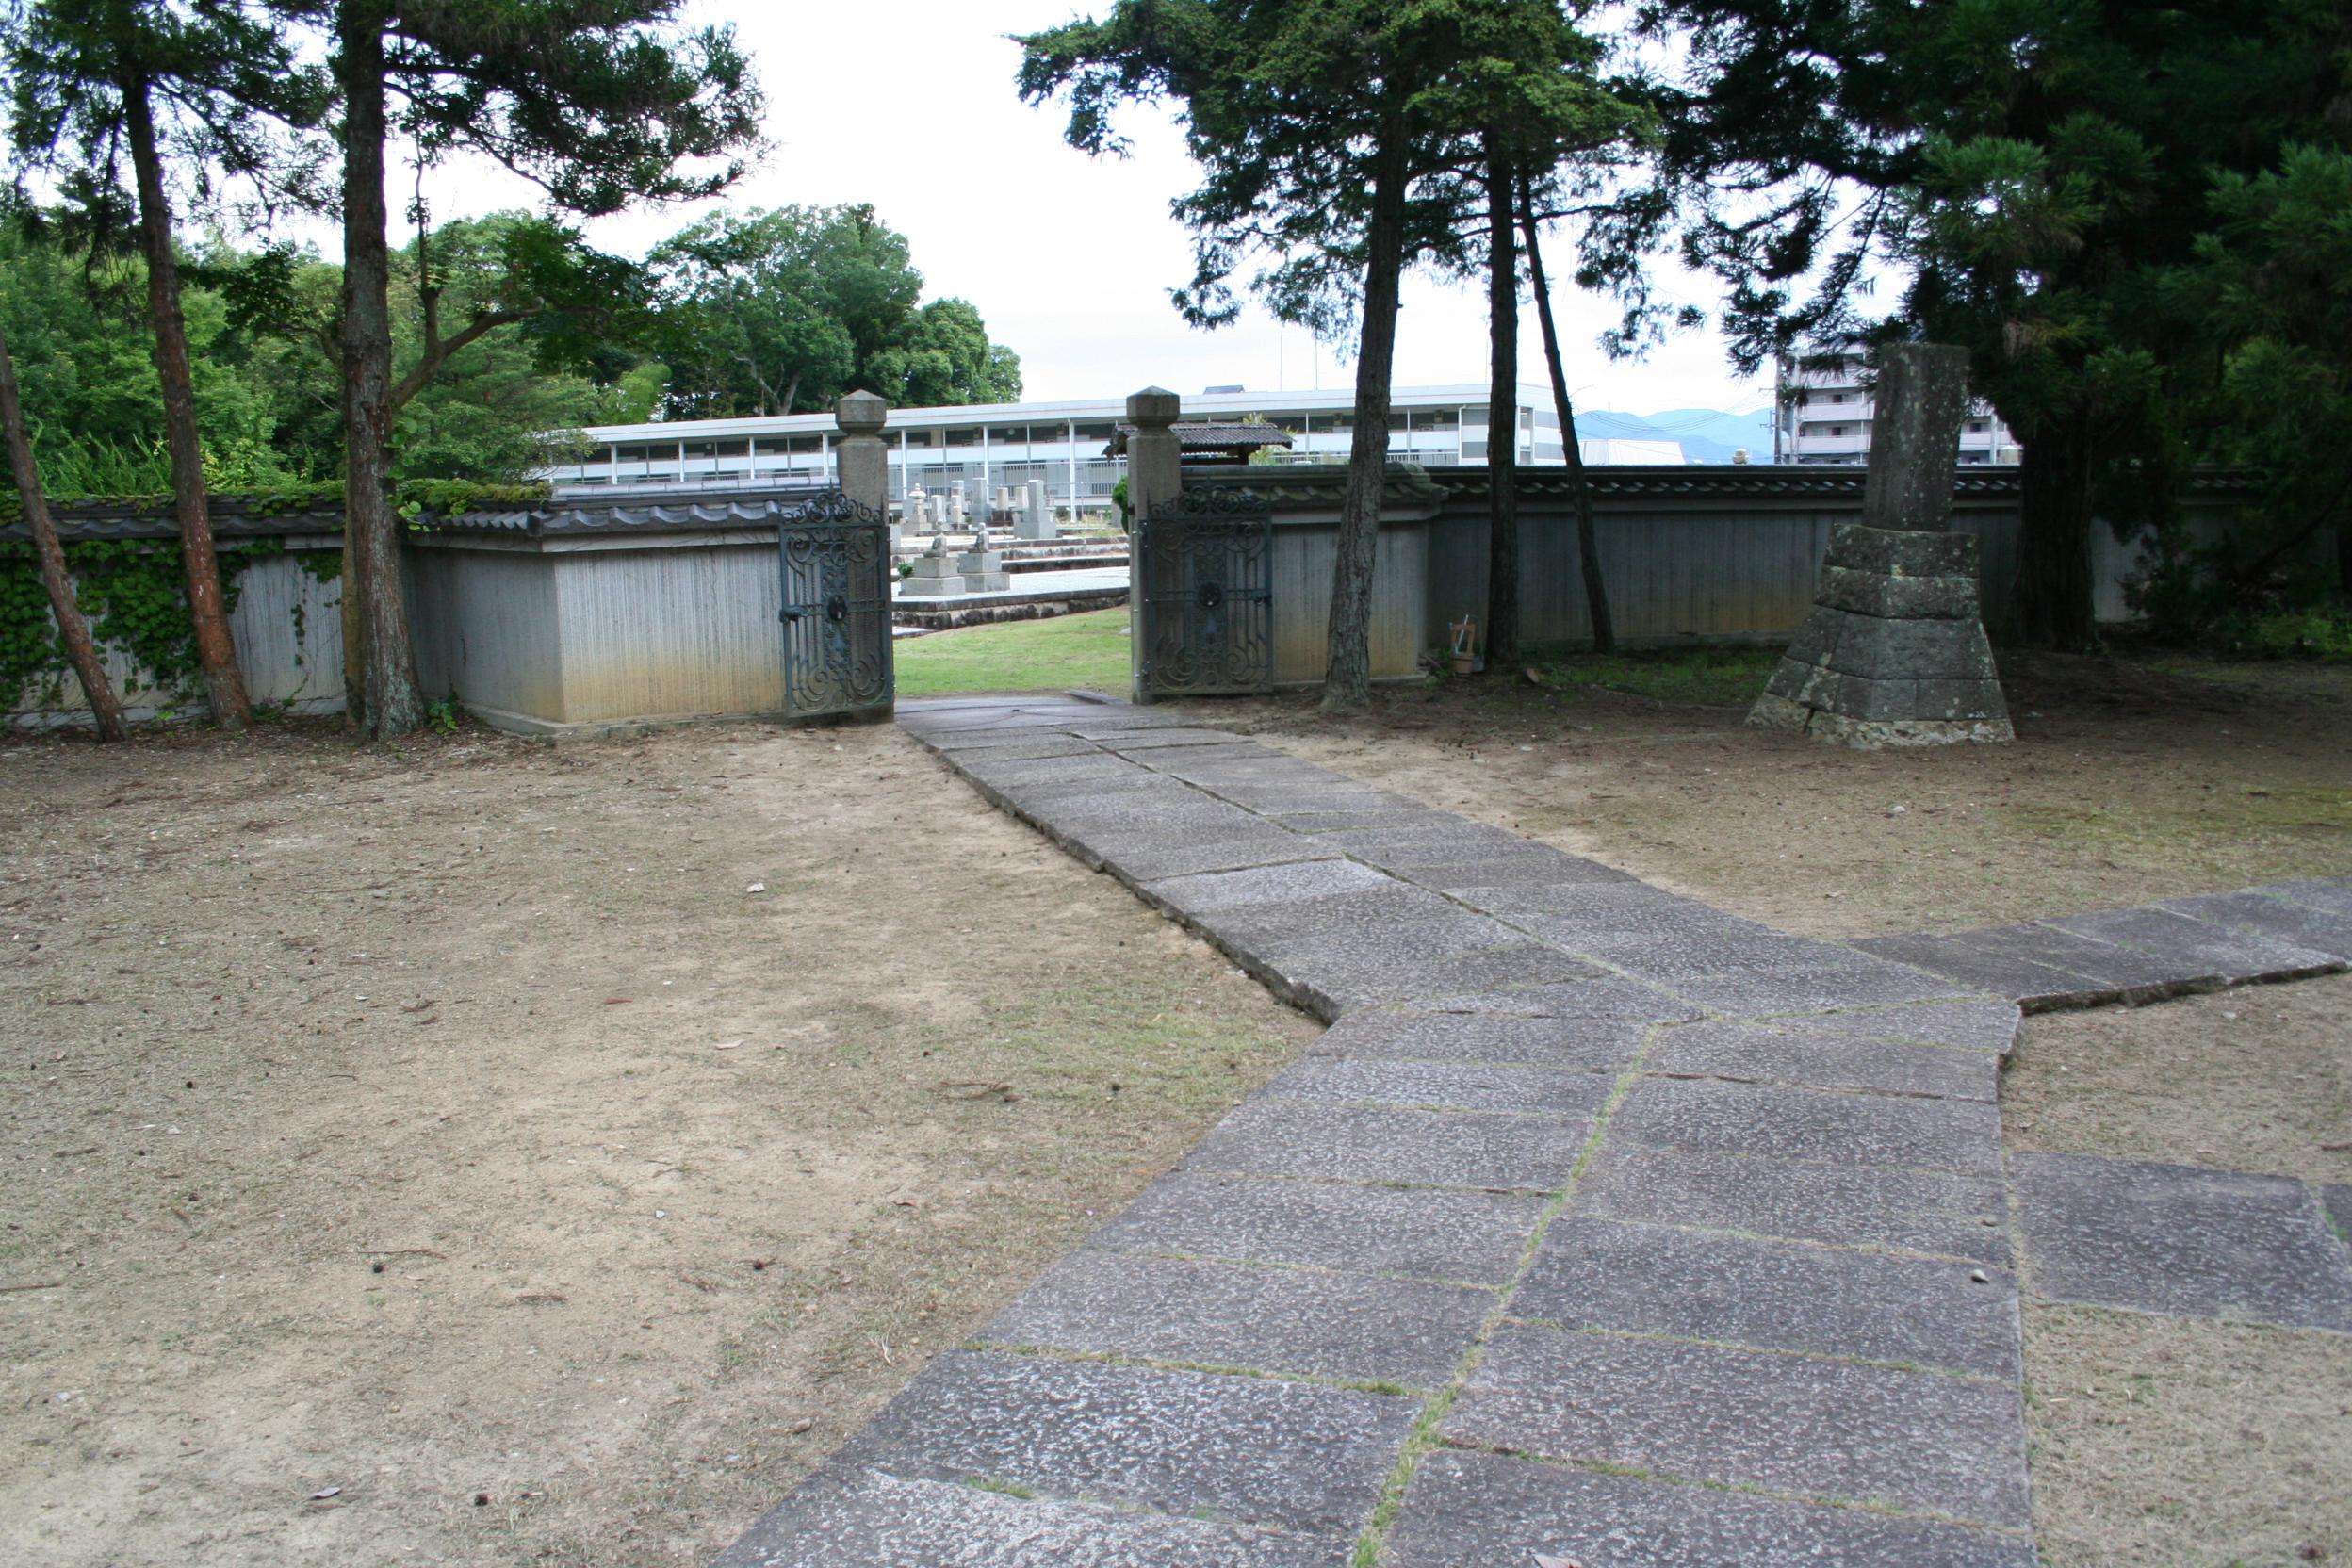 file grave yards of kukis princesses and children and takayoshi kuki